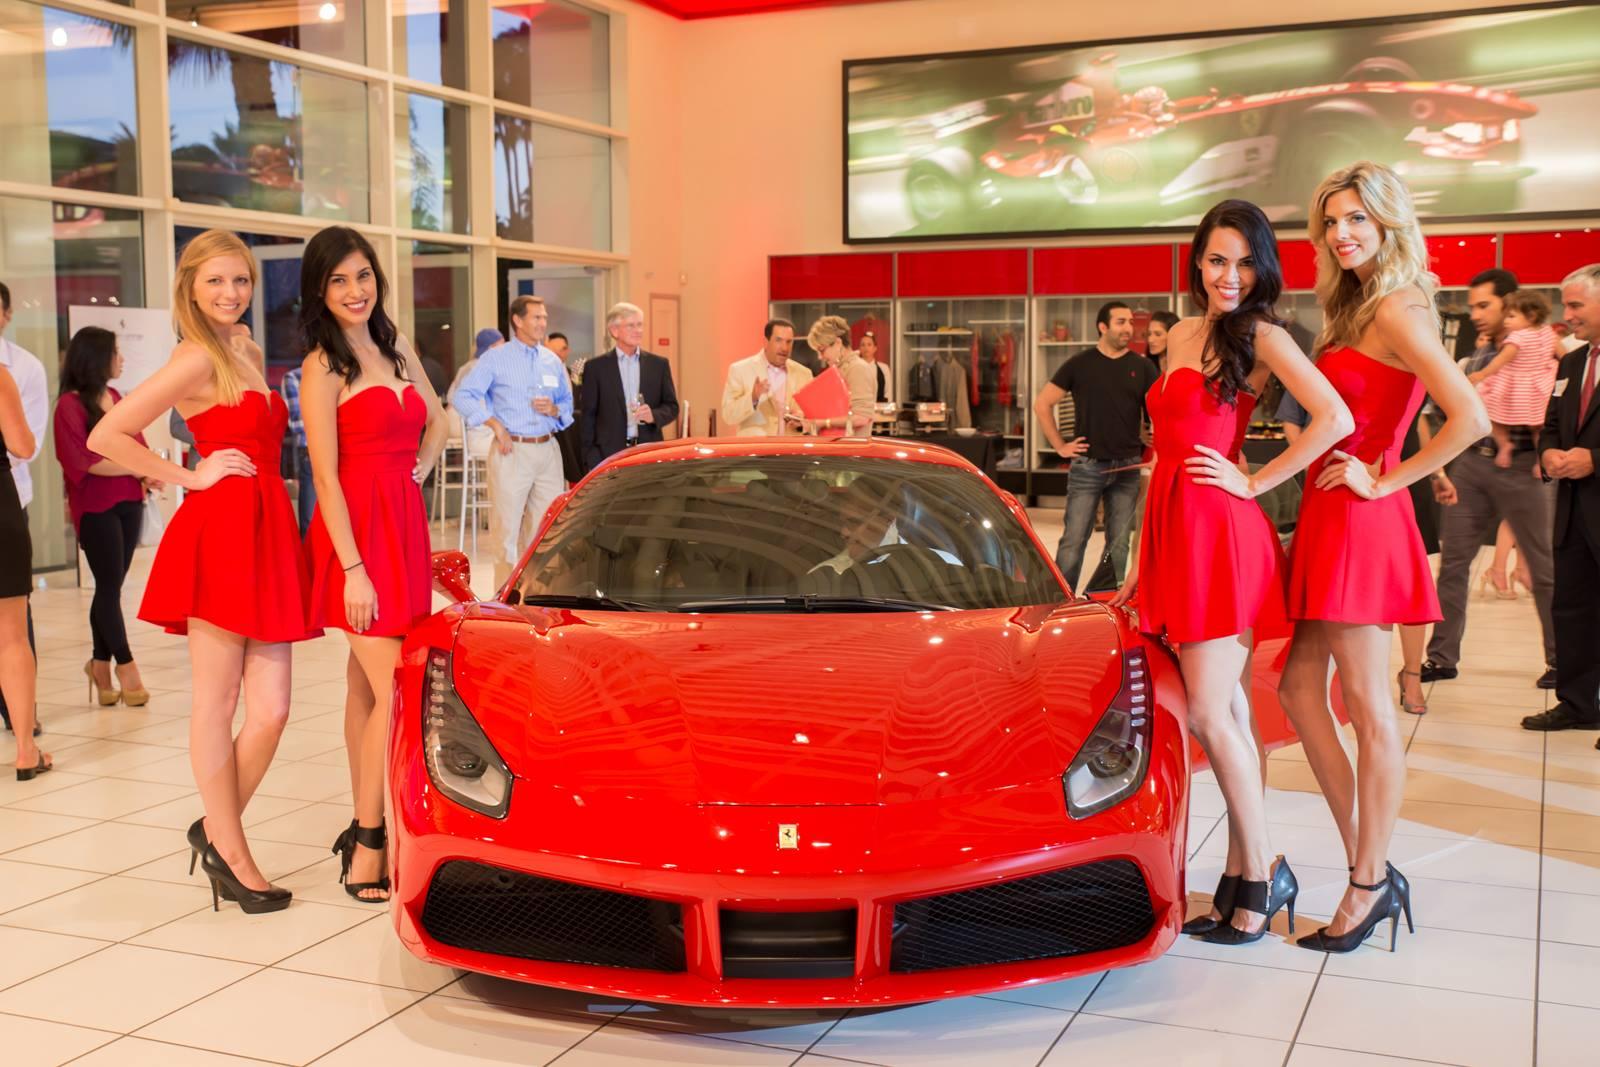 Ferrari 488 Gtb Launched With A Bang In Newport Beach Autoevolution